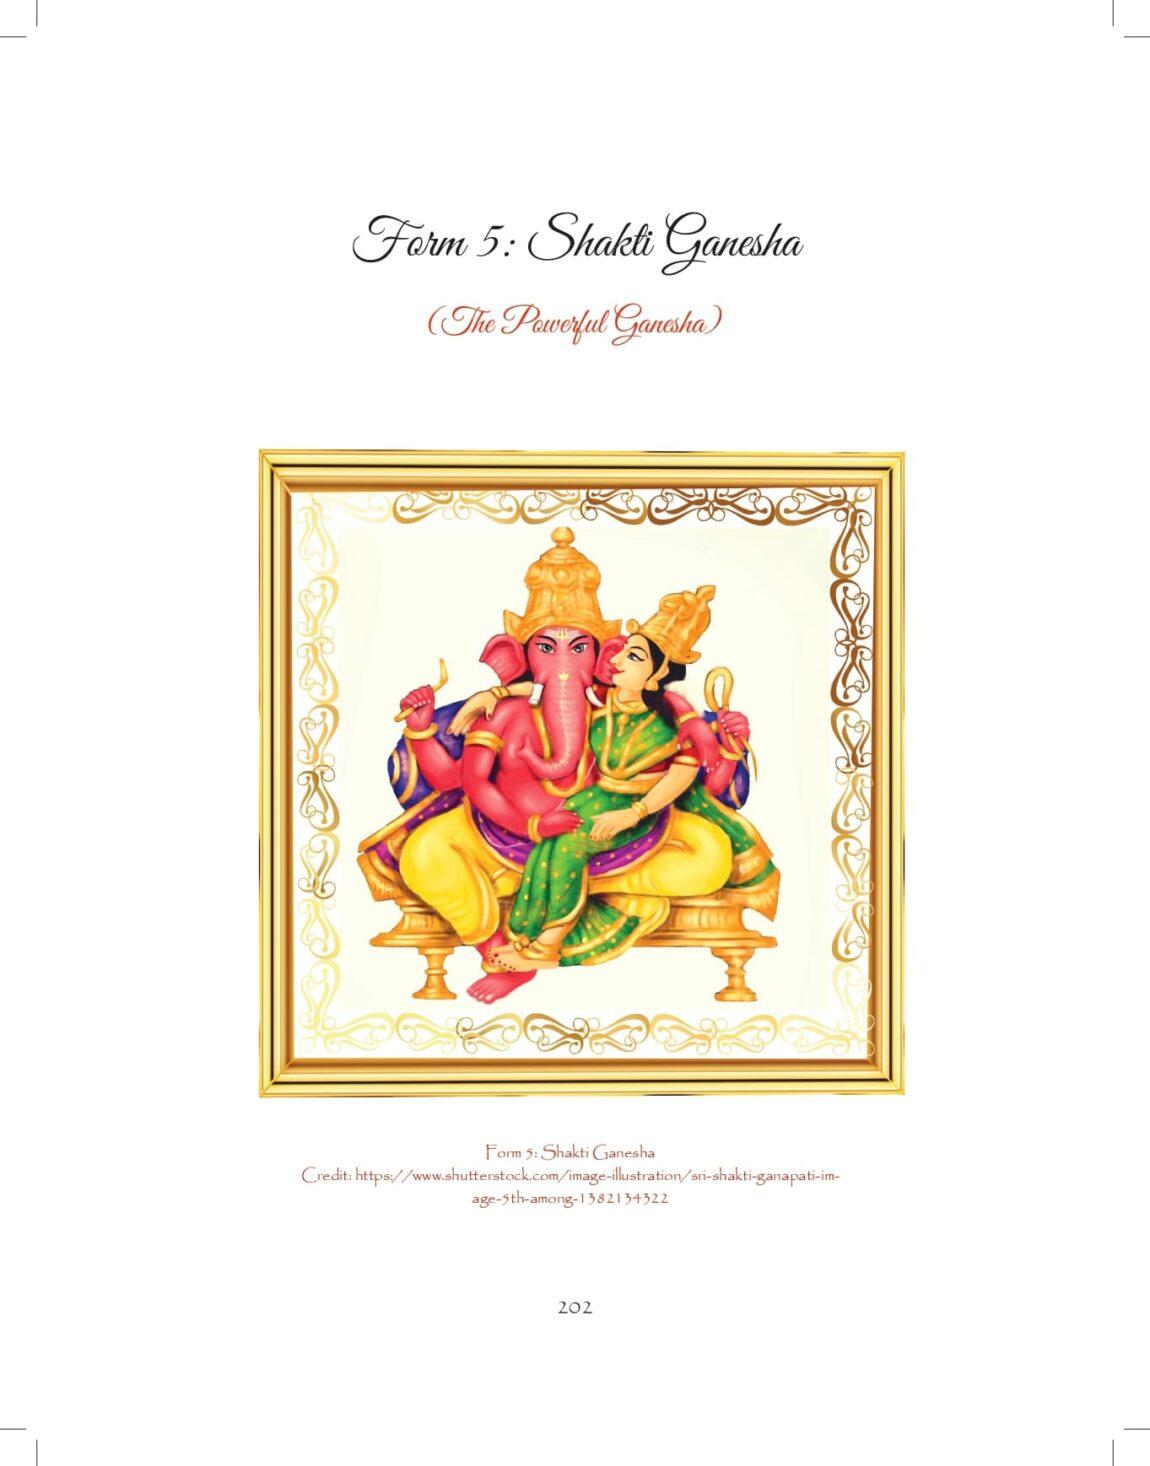 Ganesh-print_pages-to-jpg-0202.jpg